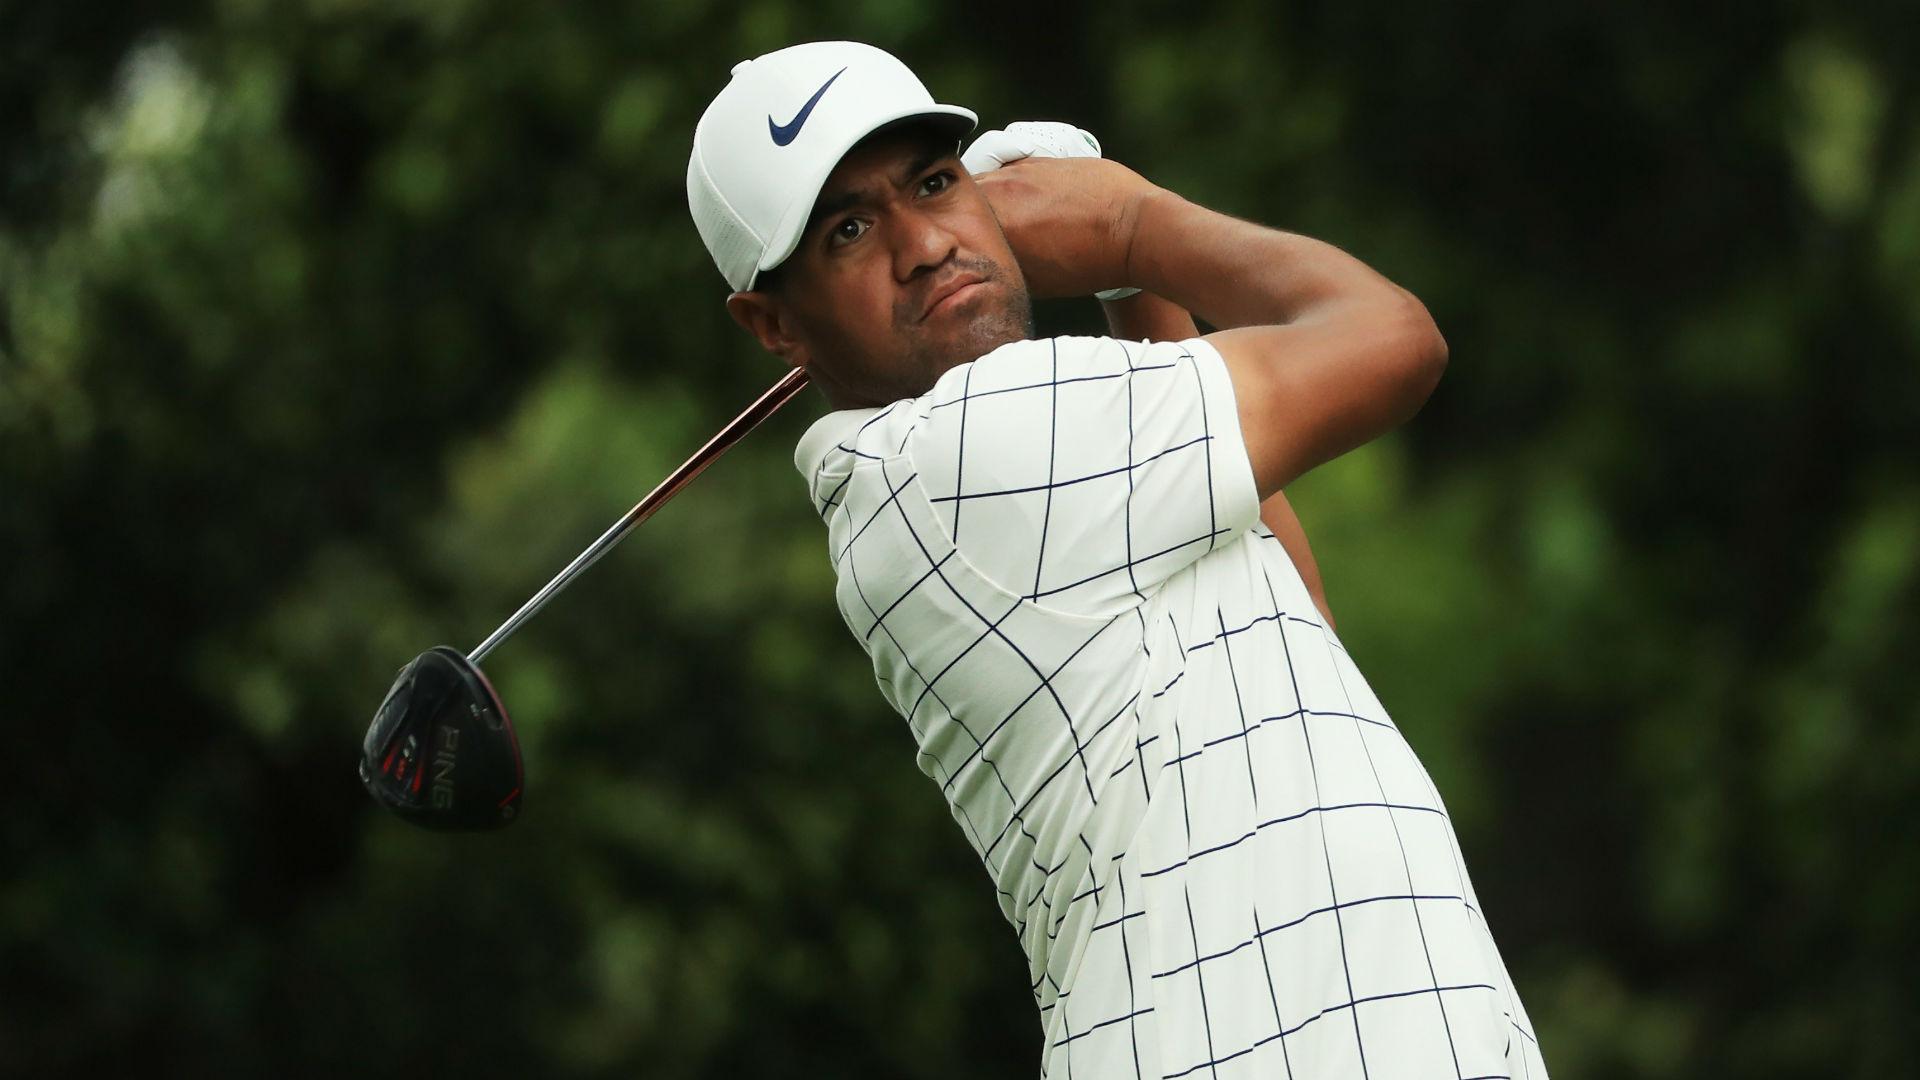 Finau storms into Masters lead, Woods starts sluggishly